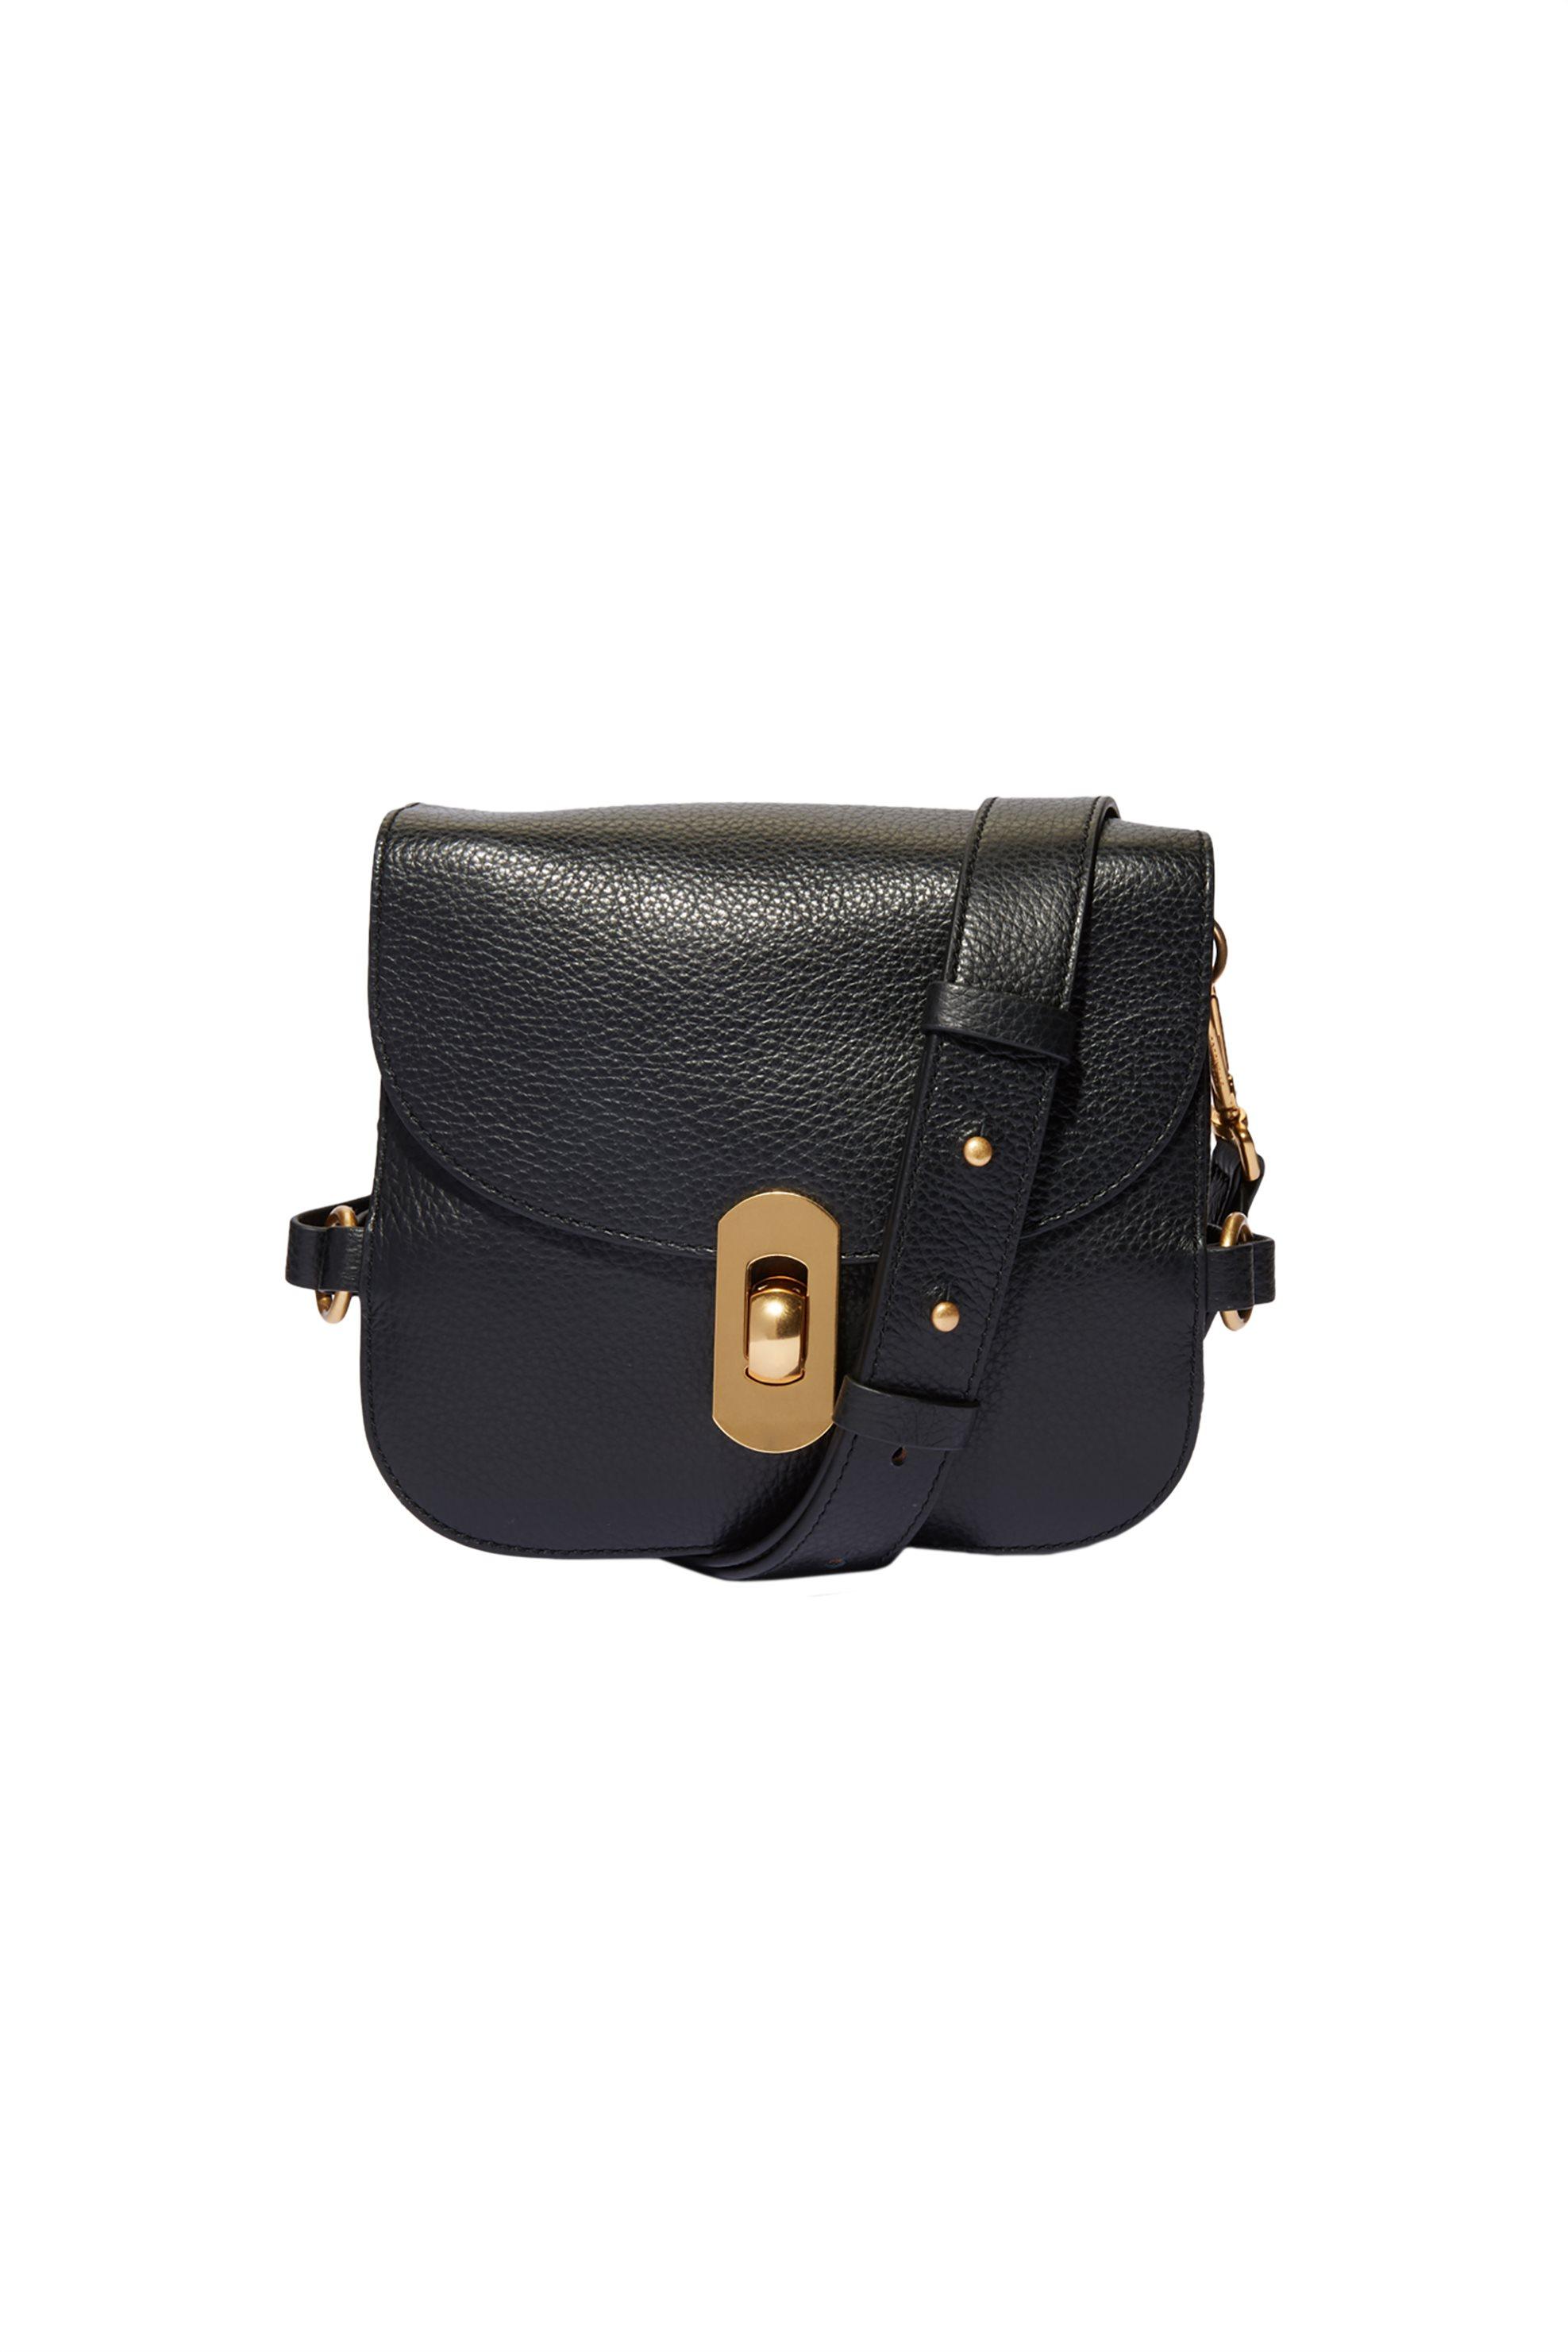 a56388dd8f Coccinelle γυναικεία τσάντα crossbody Zaniah Mini - E1DG0-550101 - Μαύρο